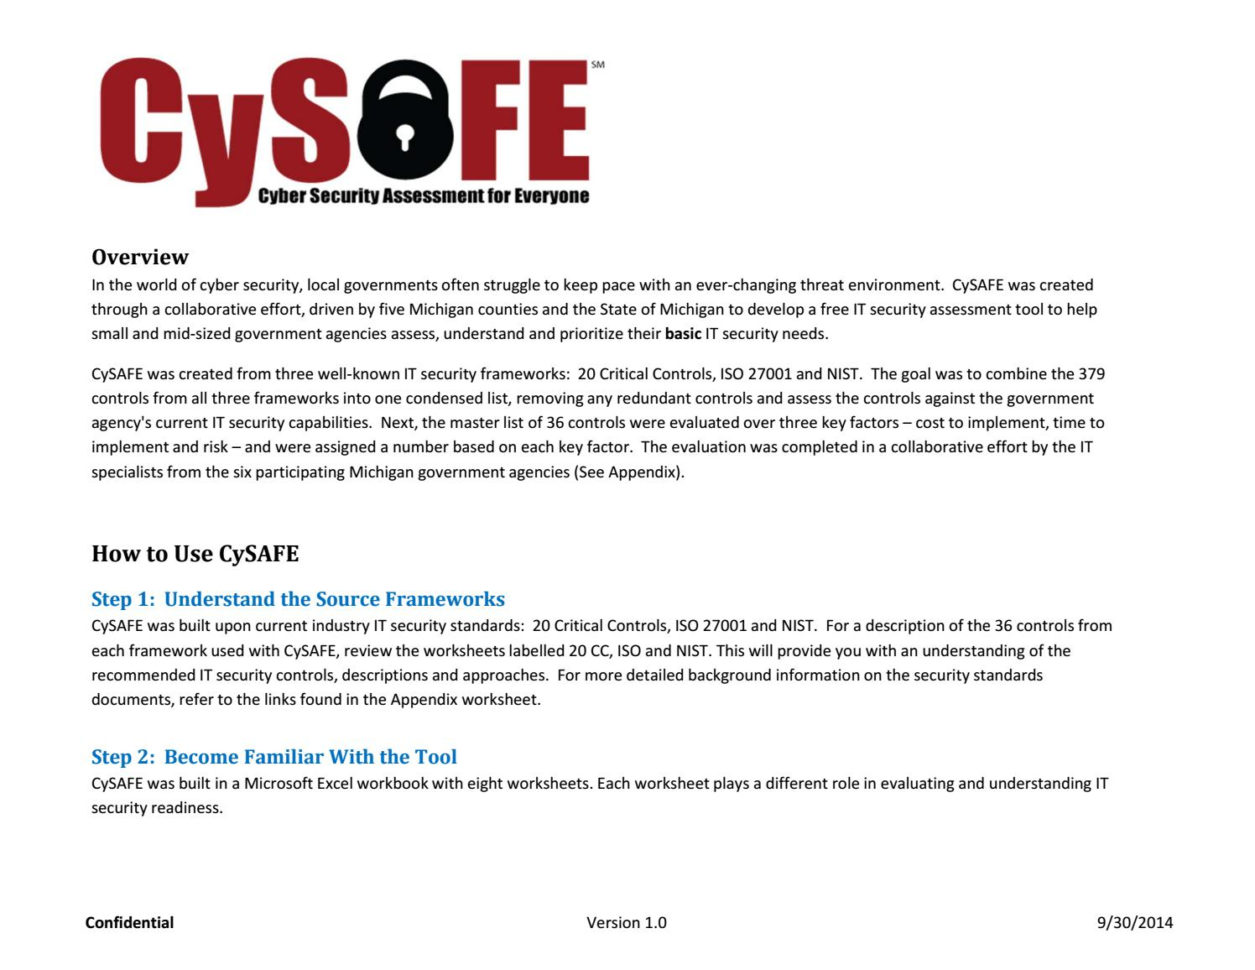 Cybersecurity Assessment Tool Spreadsheet Within Cysafe Vendor Sampledistilledinfo  Issuu